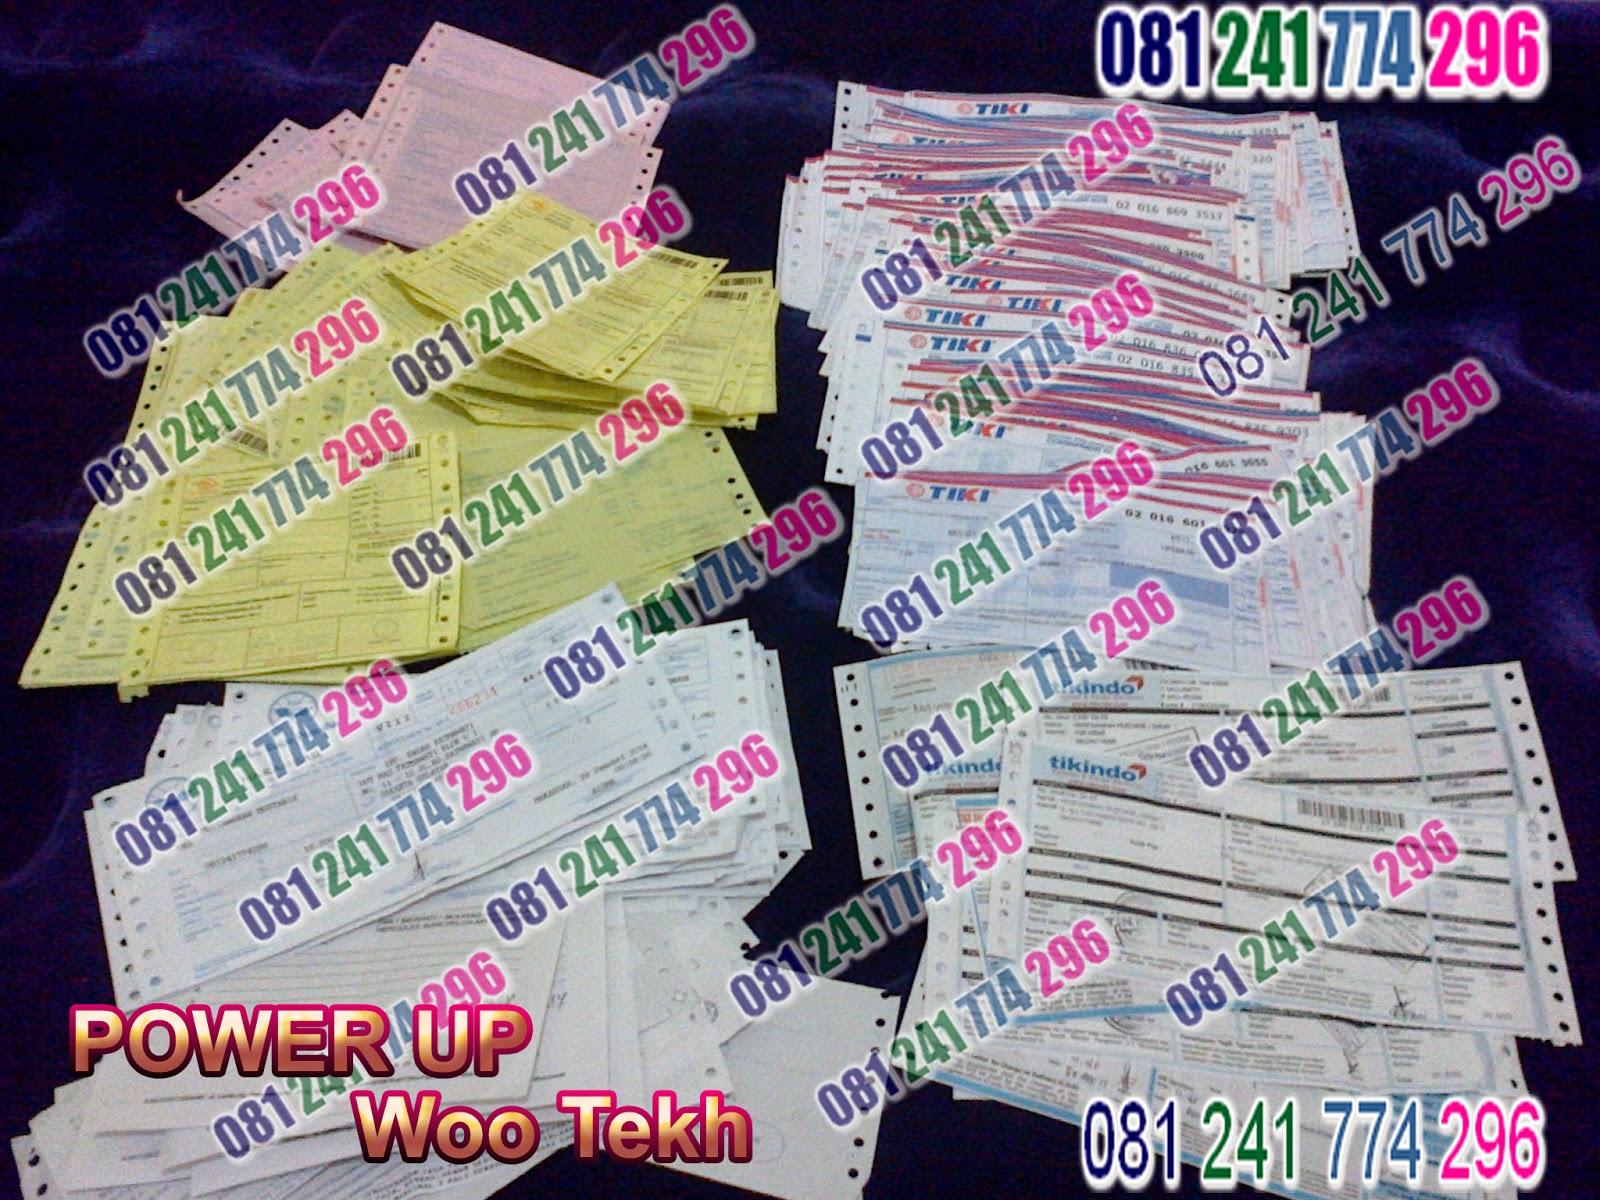 Power Up Woo Tekh